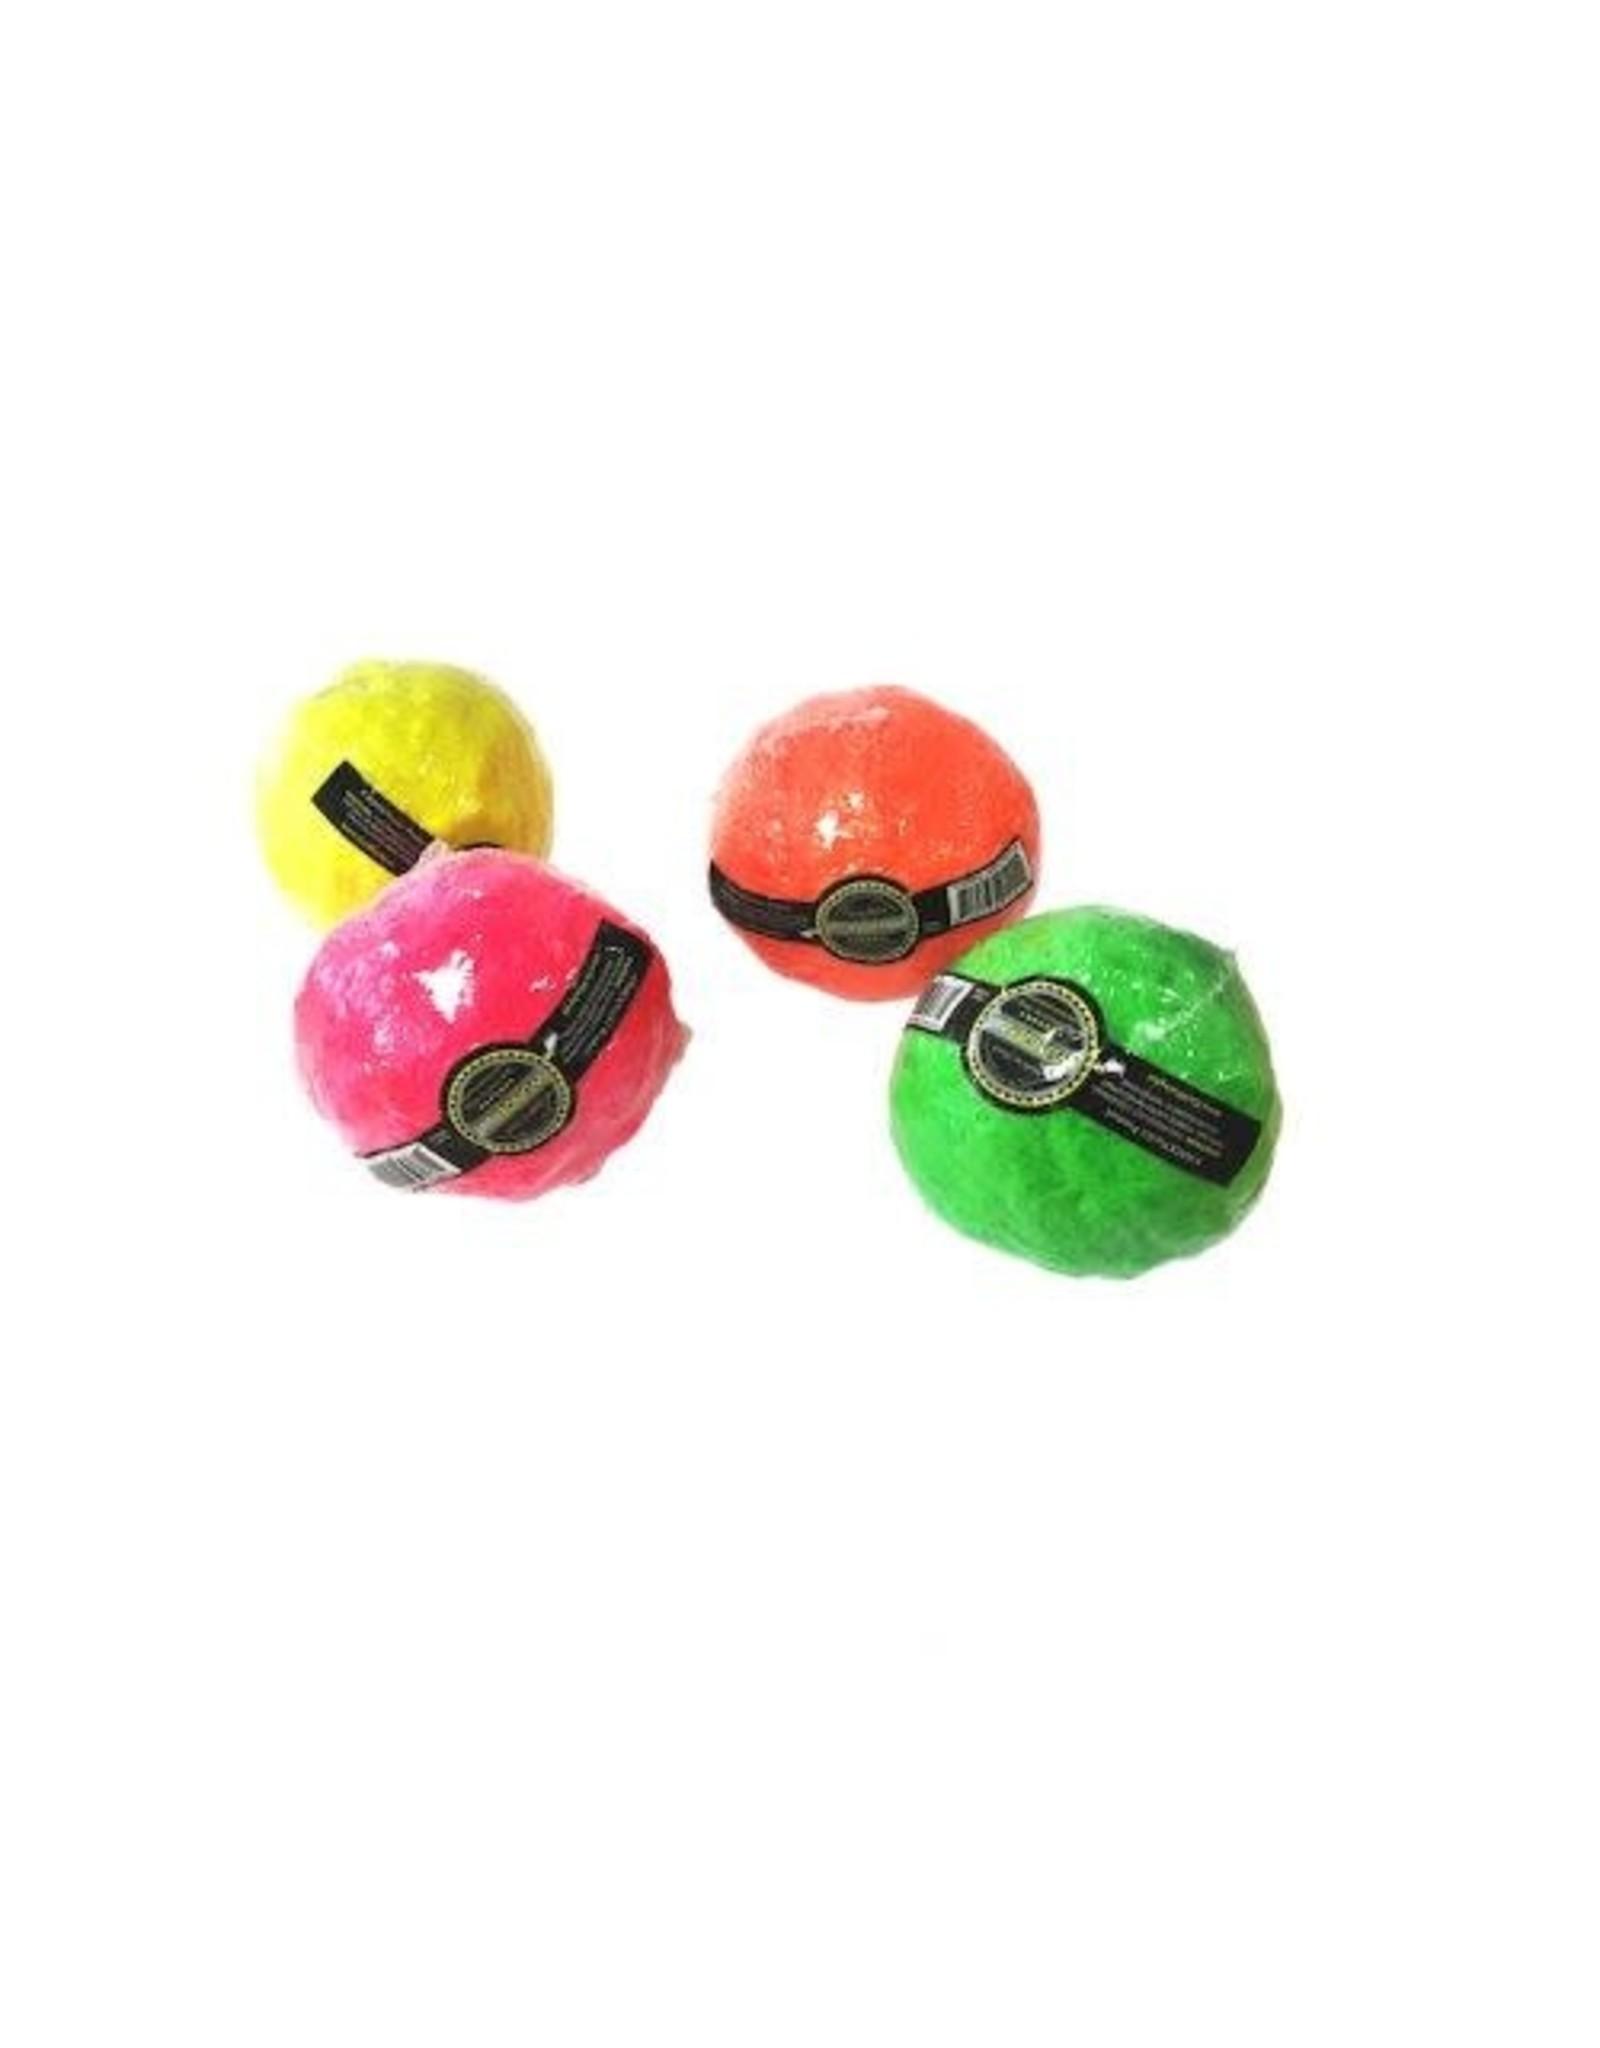 Medium WUNDER ball dog toy